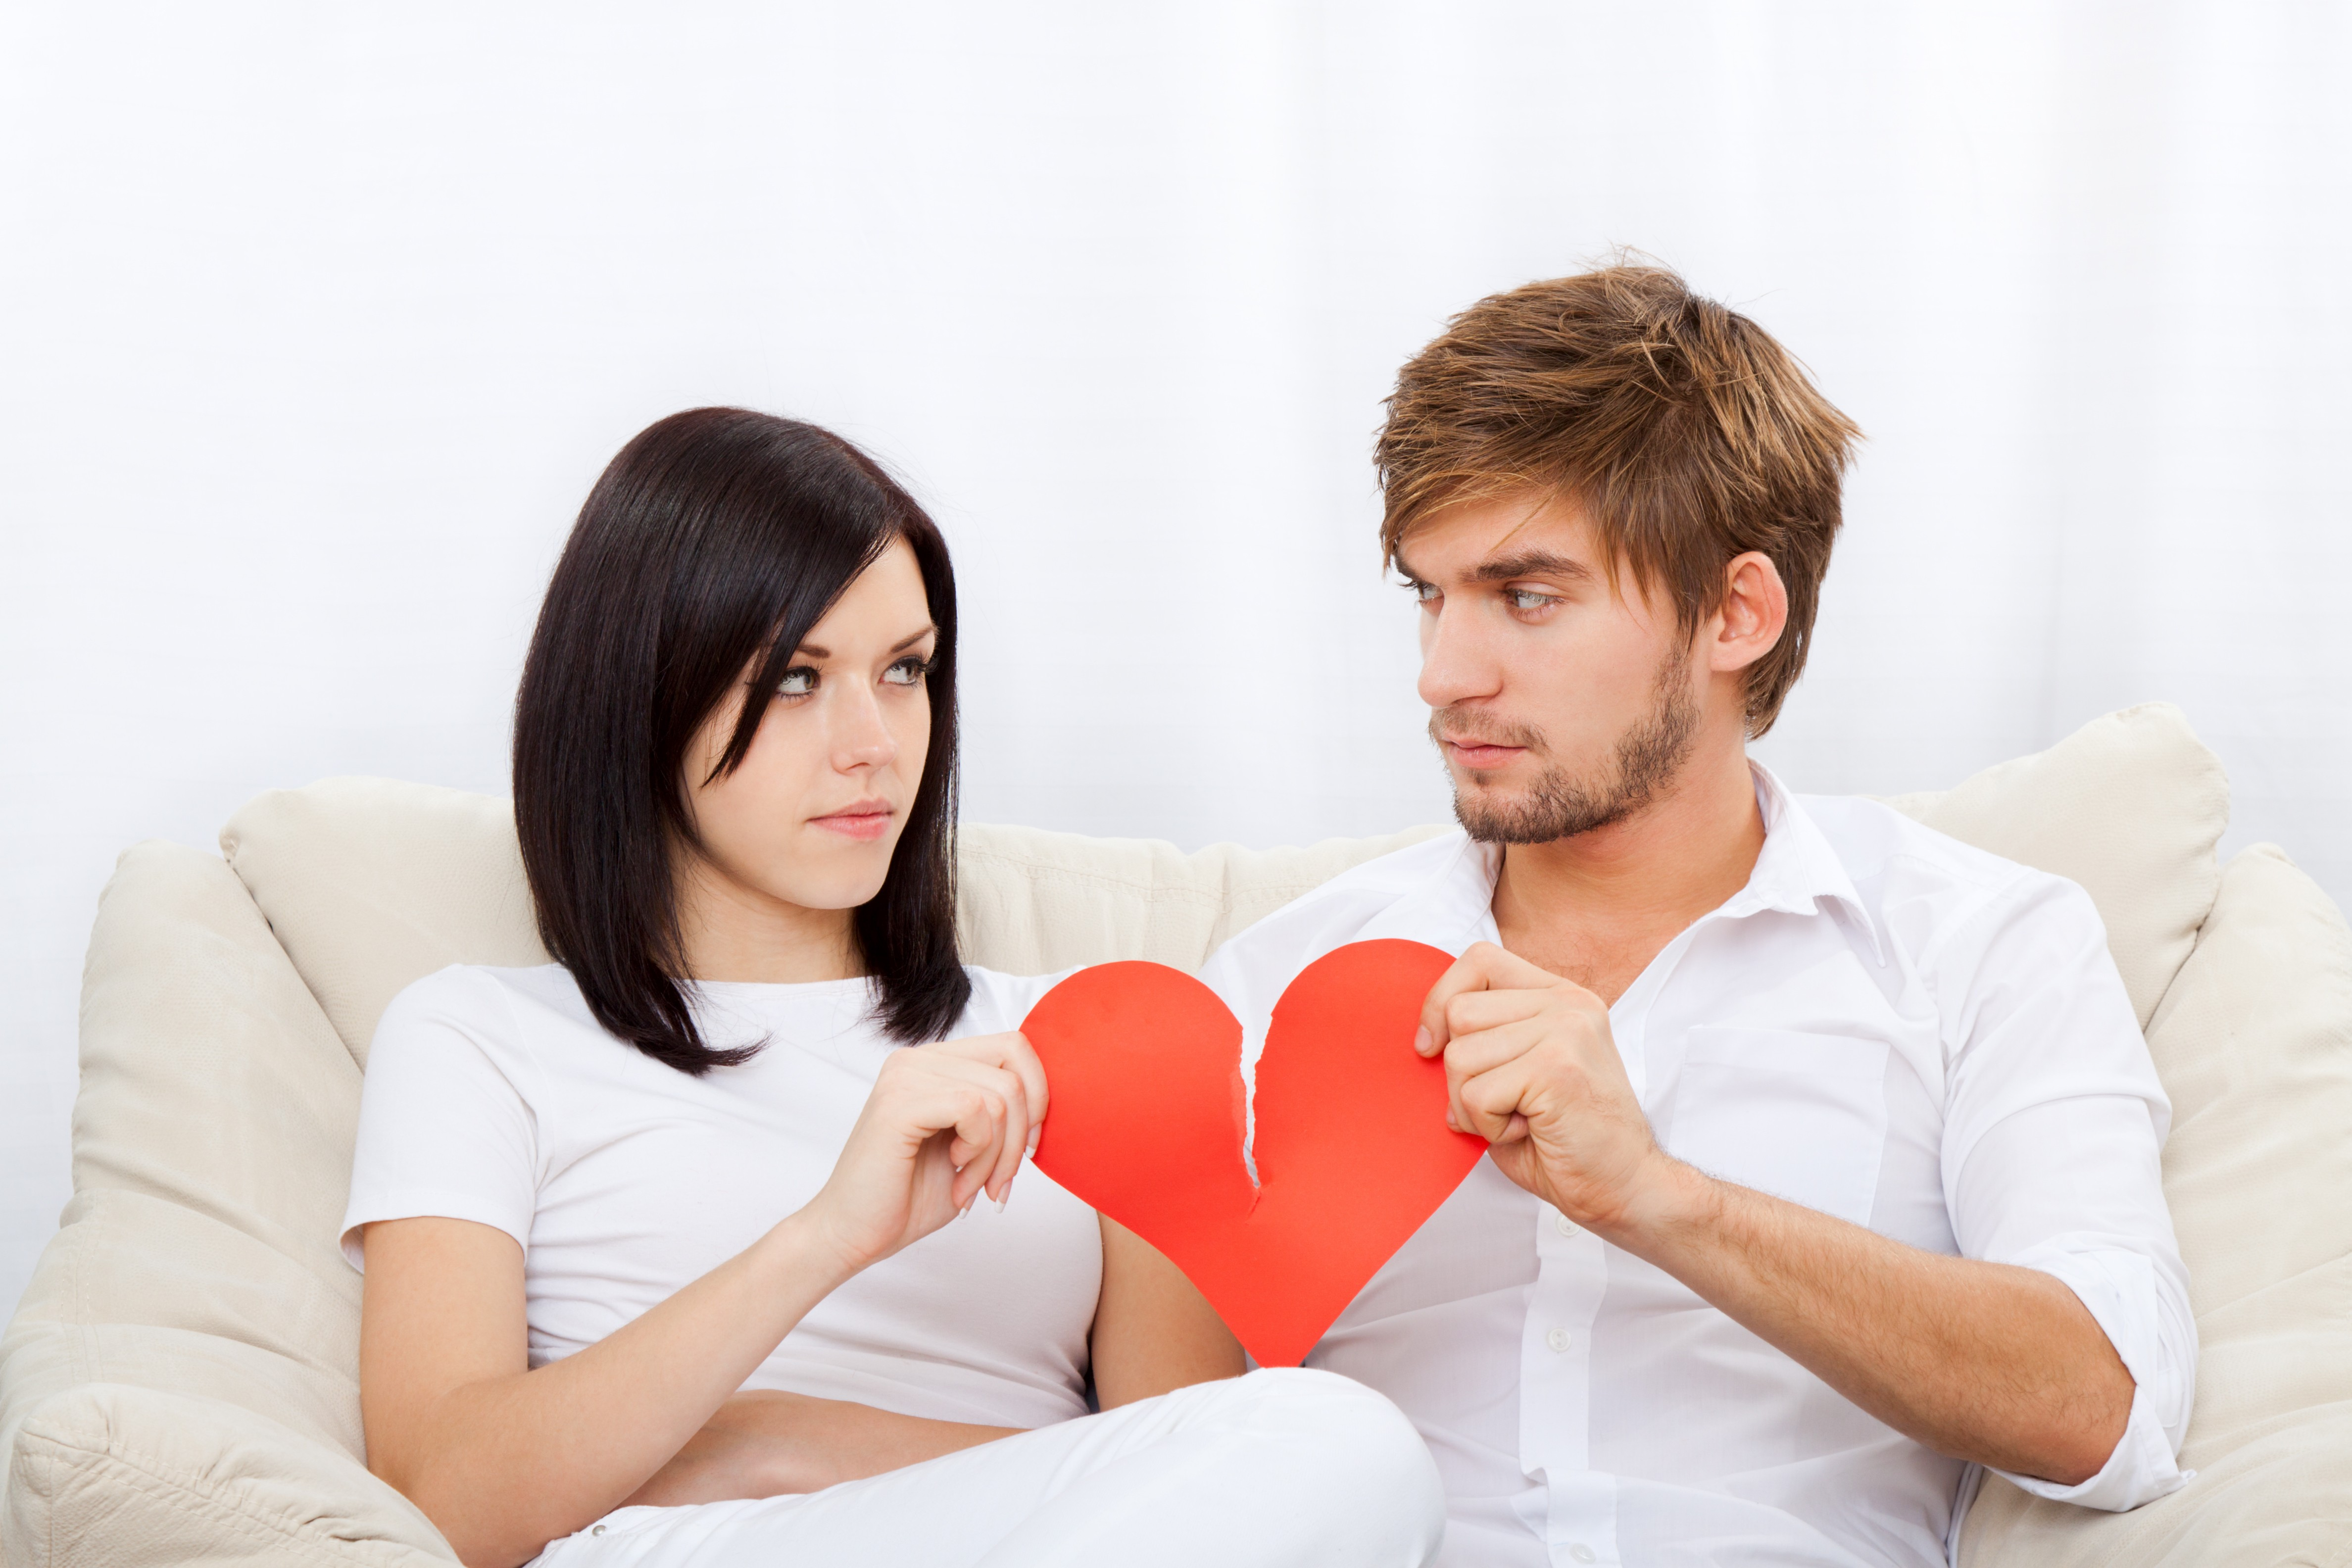 Съем девушек развод на секс 16 фотография